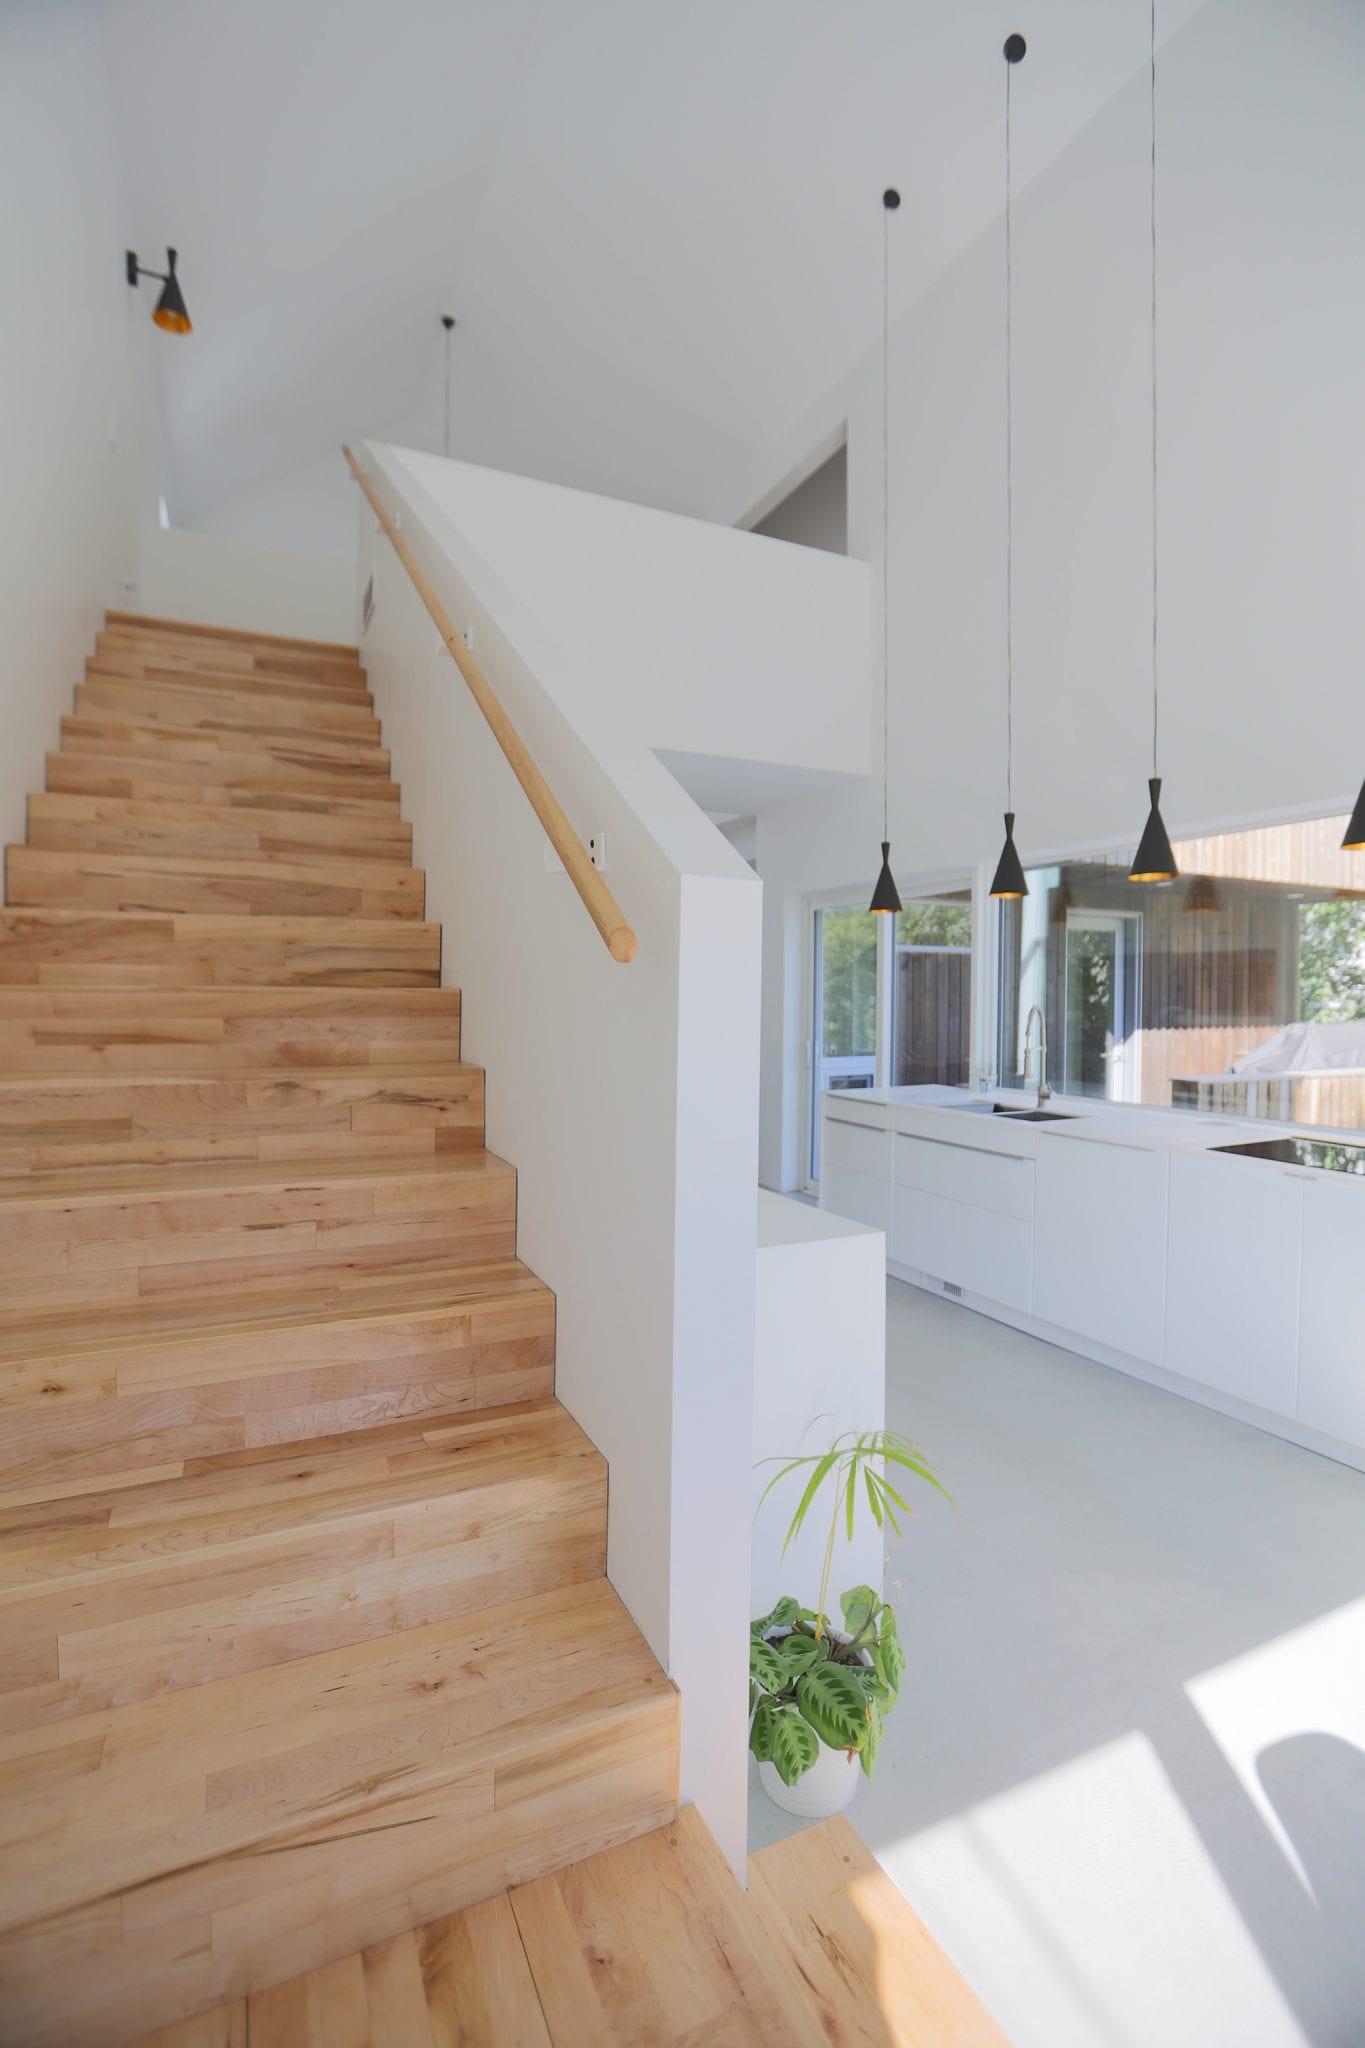 Design-Built New Home Build